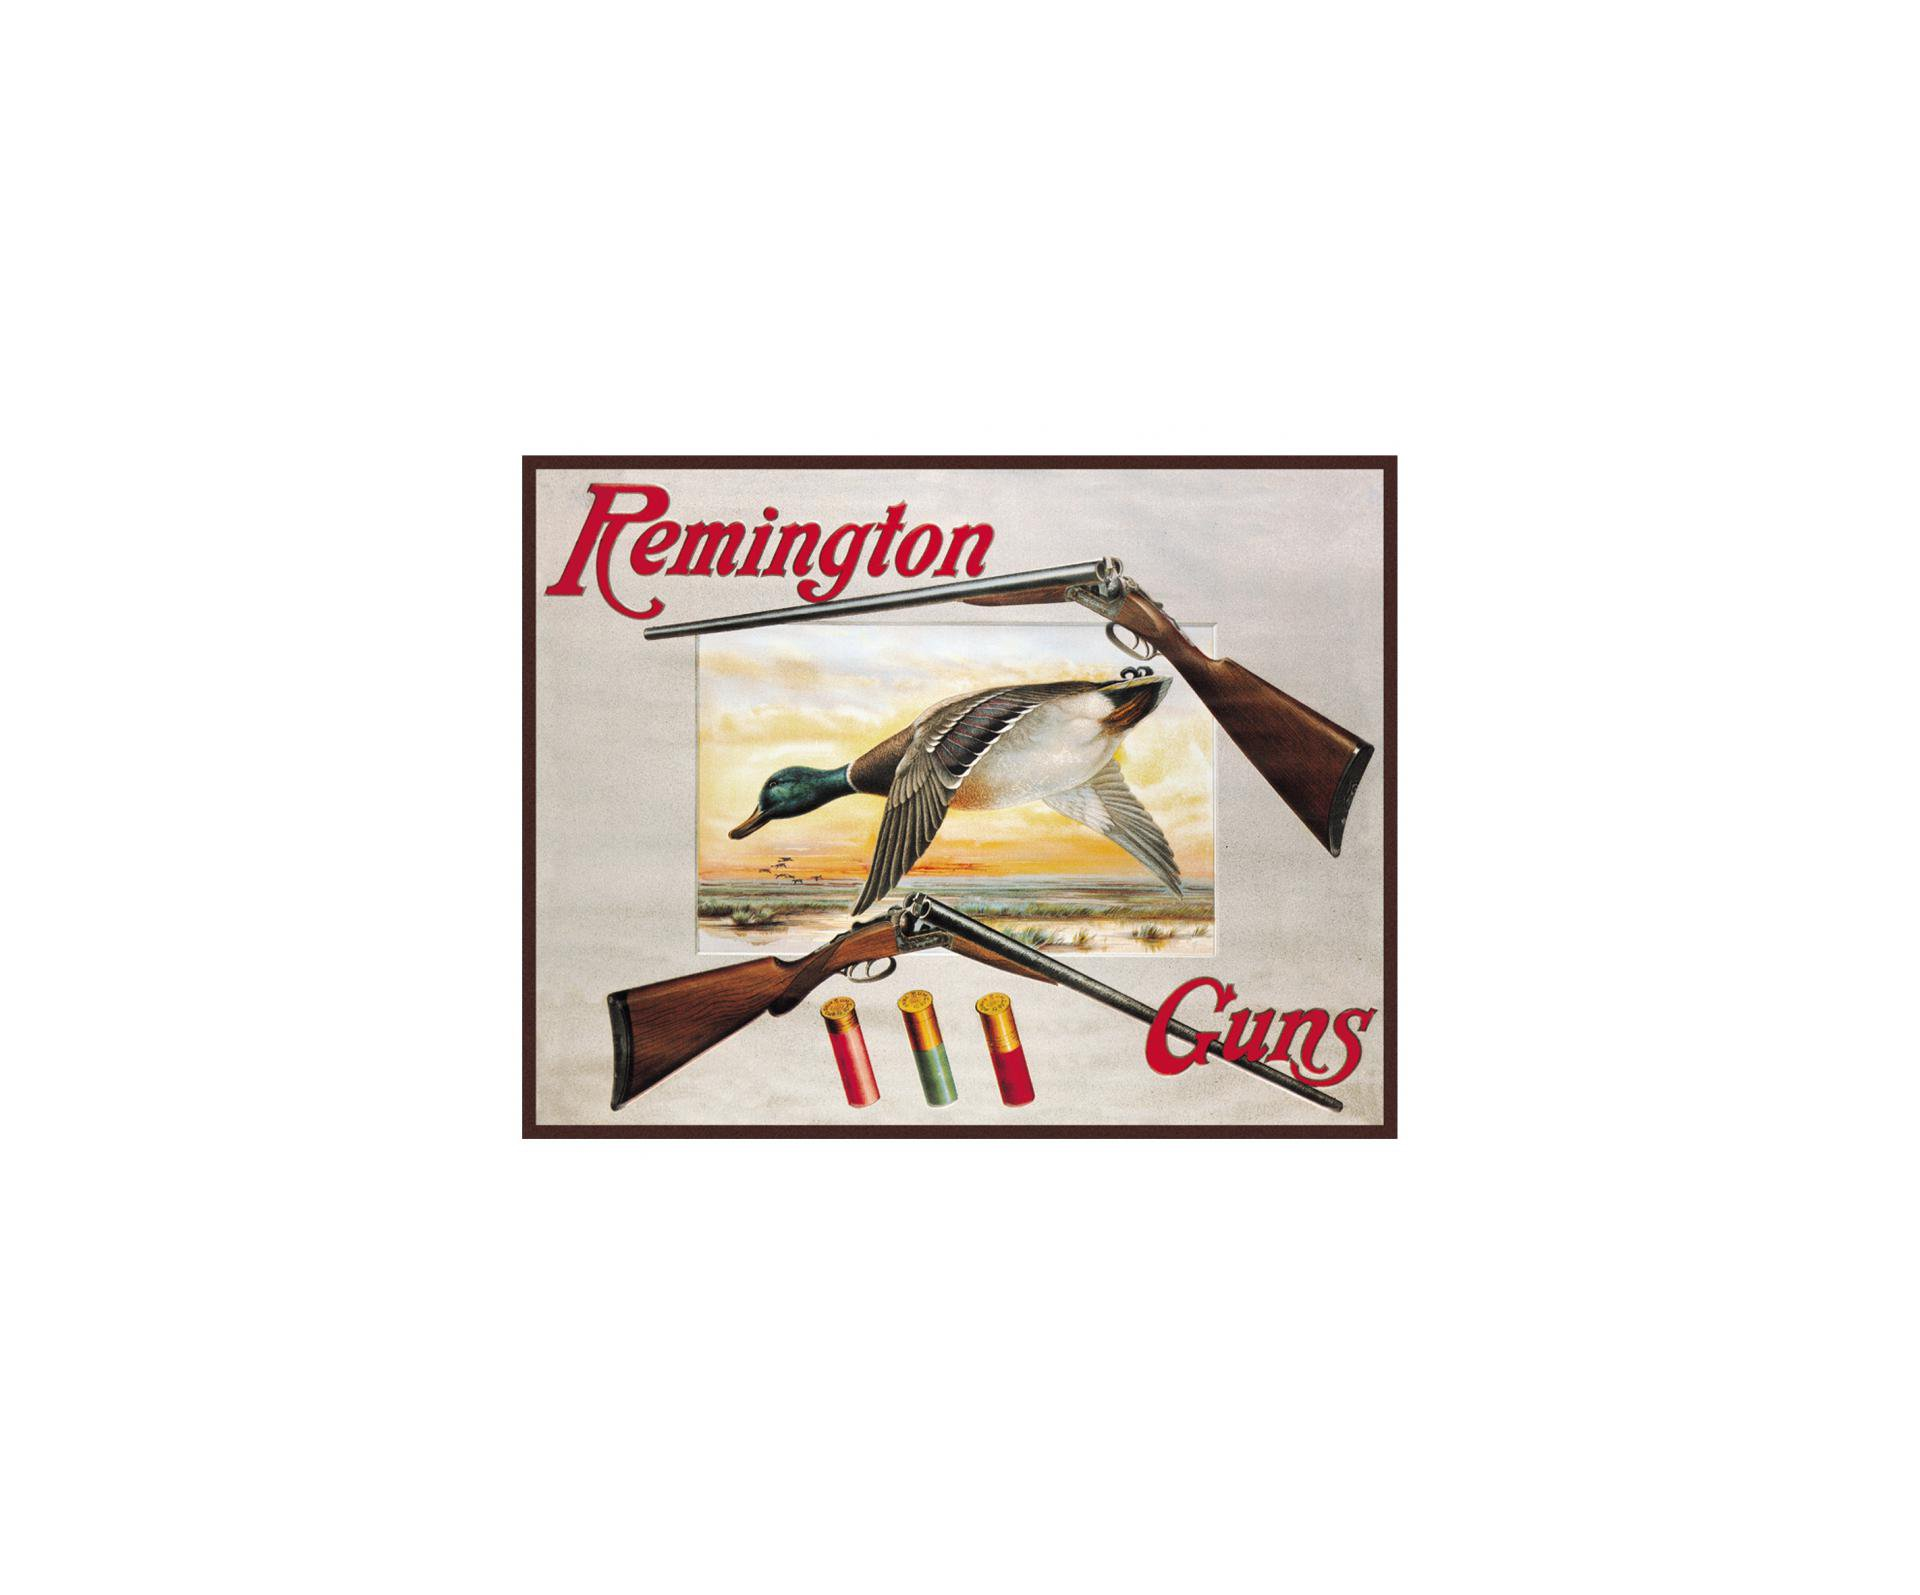 Placa Metálica Decorativa Remington Guns - Rossi